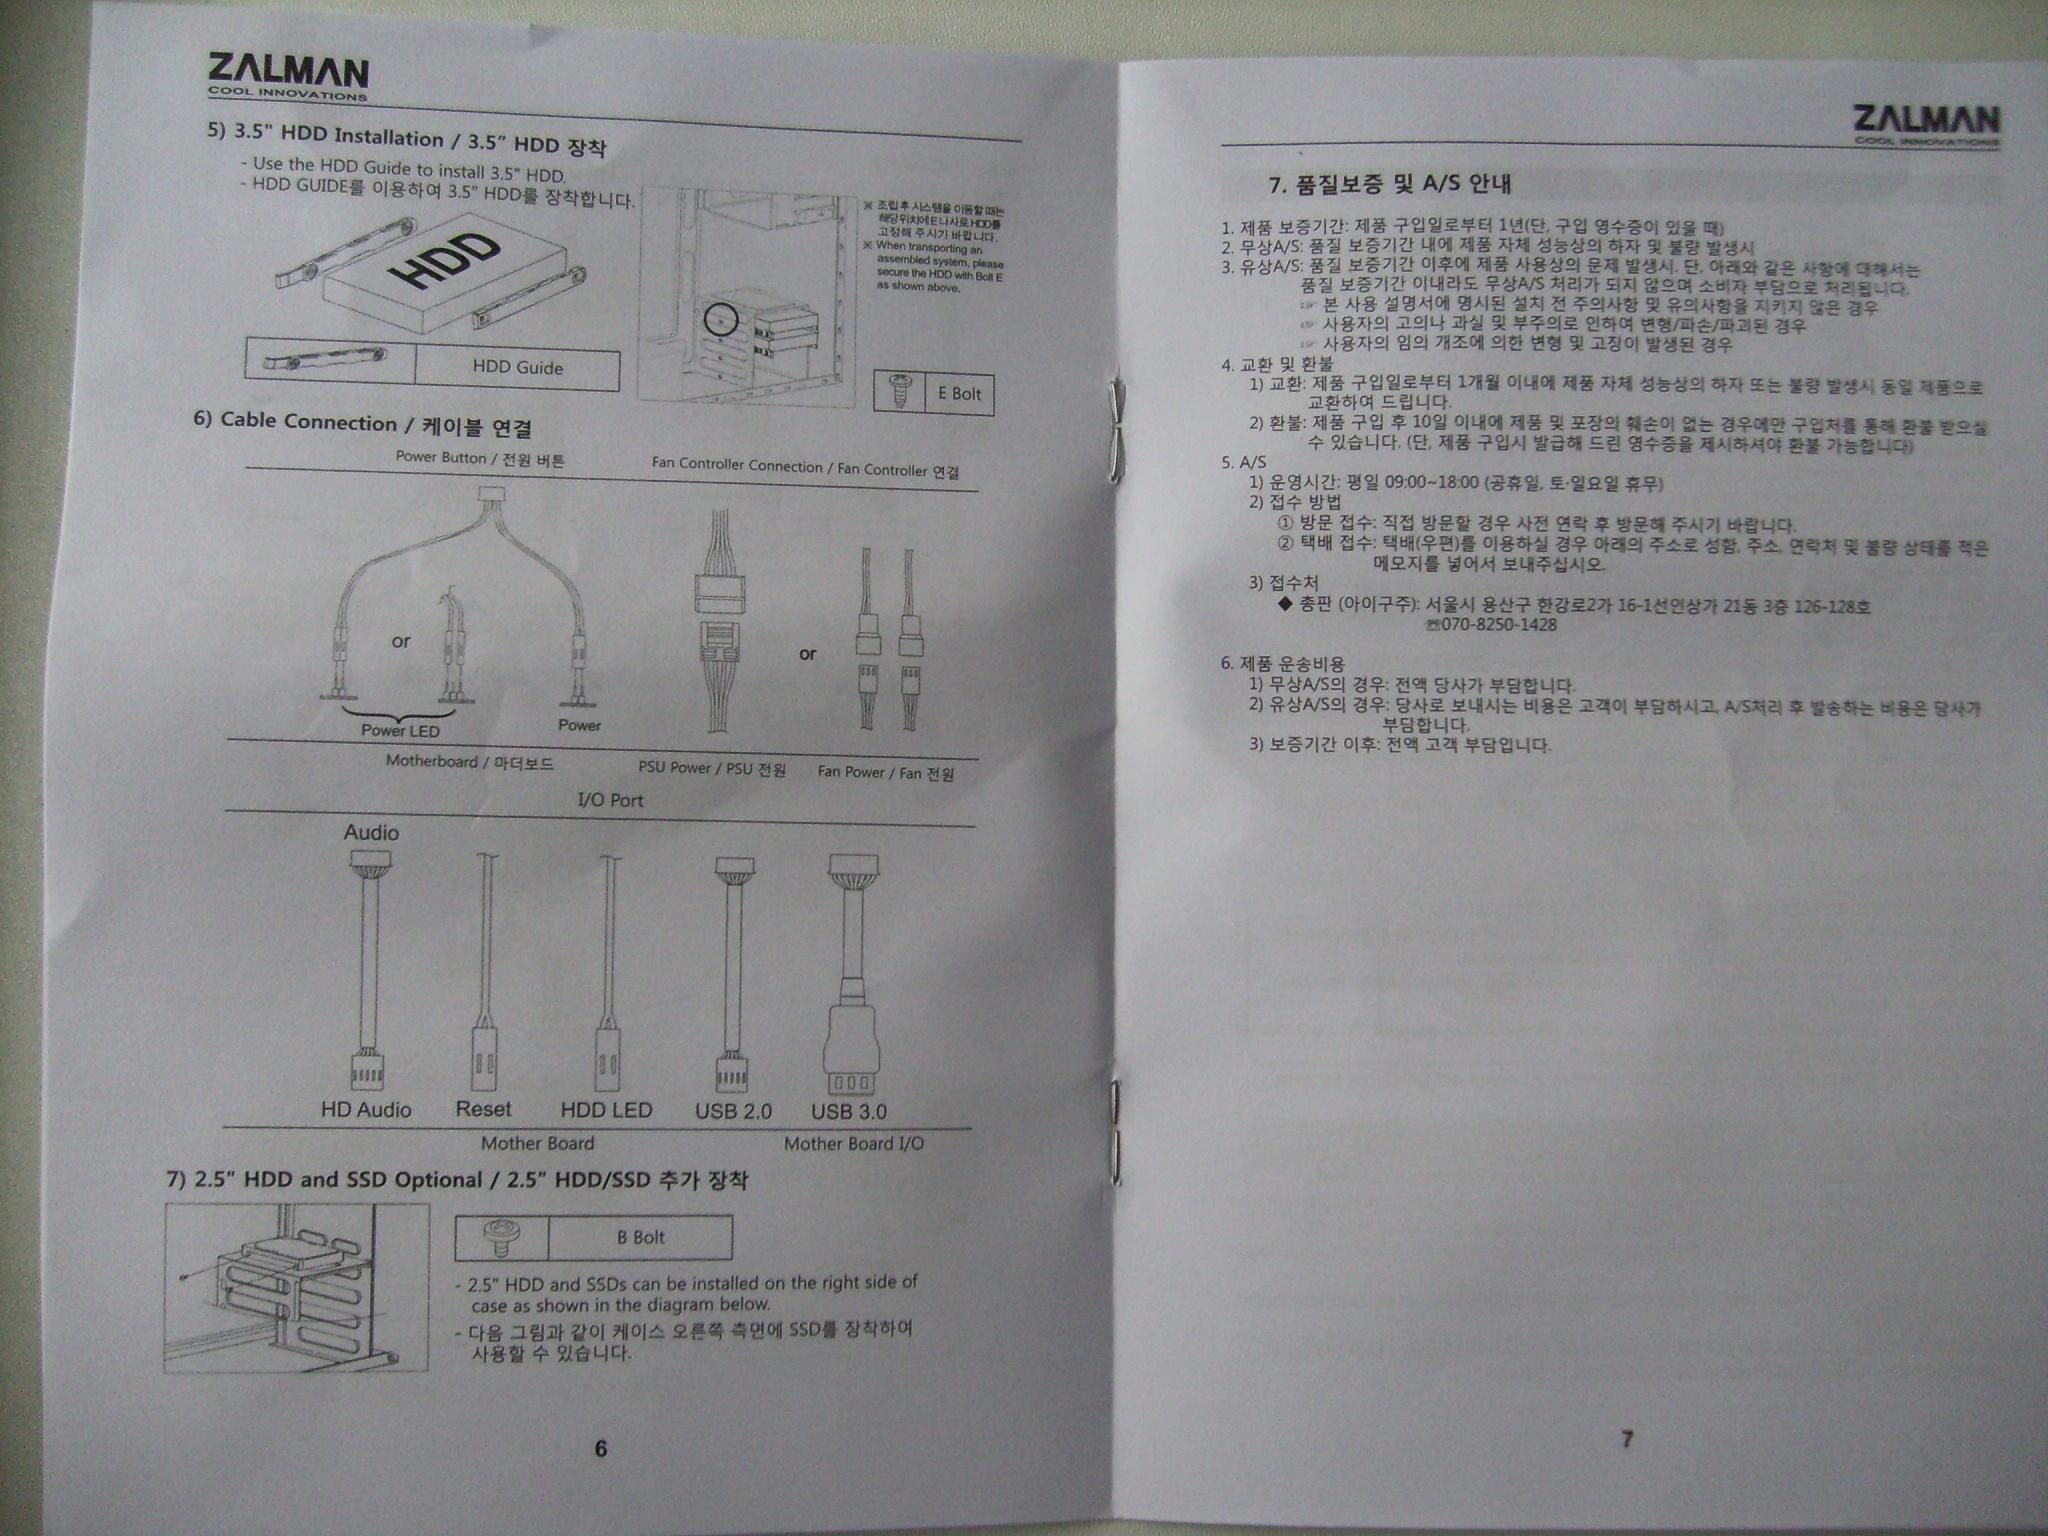 инструкция zalman z3 plus на русском